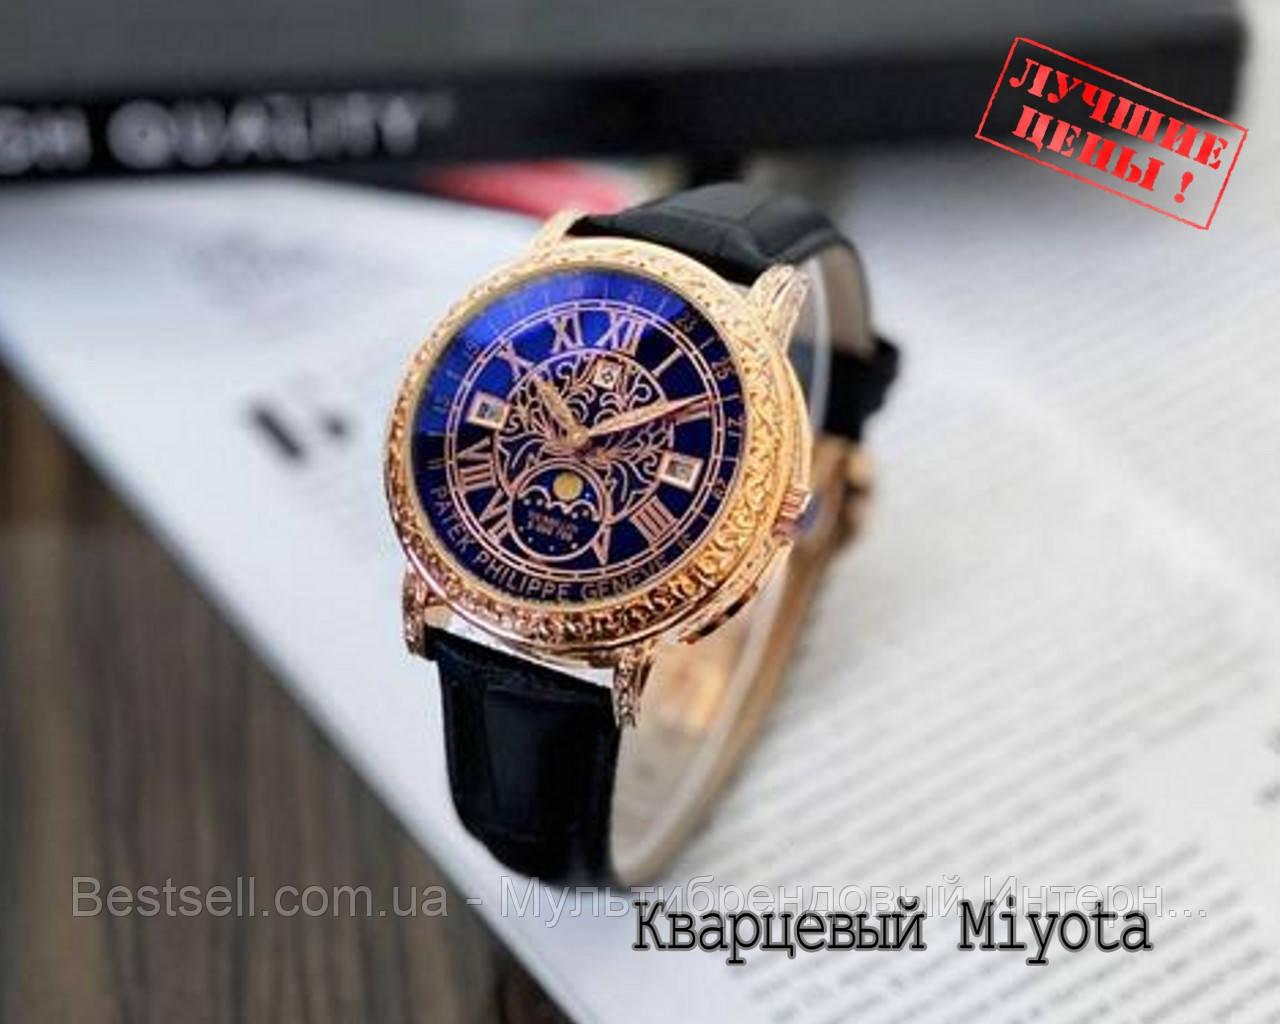 Часы мужские наручные Patek Philippe Grand Complications 6002 Sky Moon патек филип Реплика ААА класса